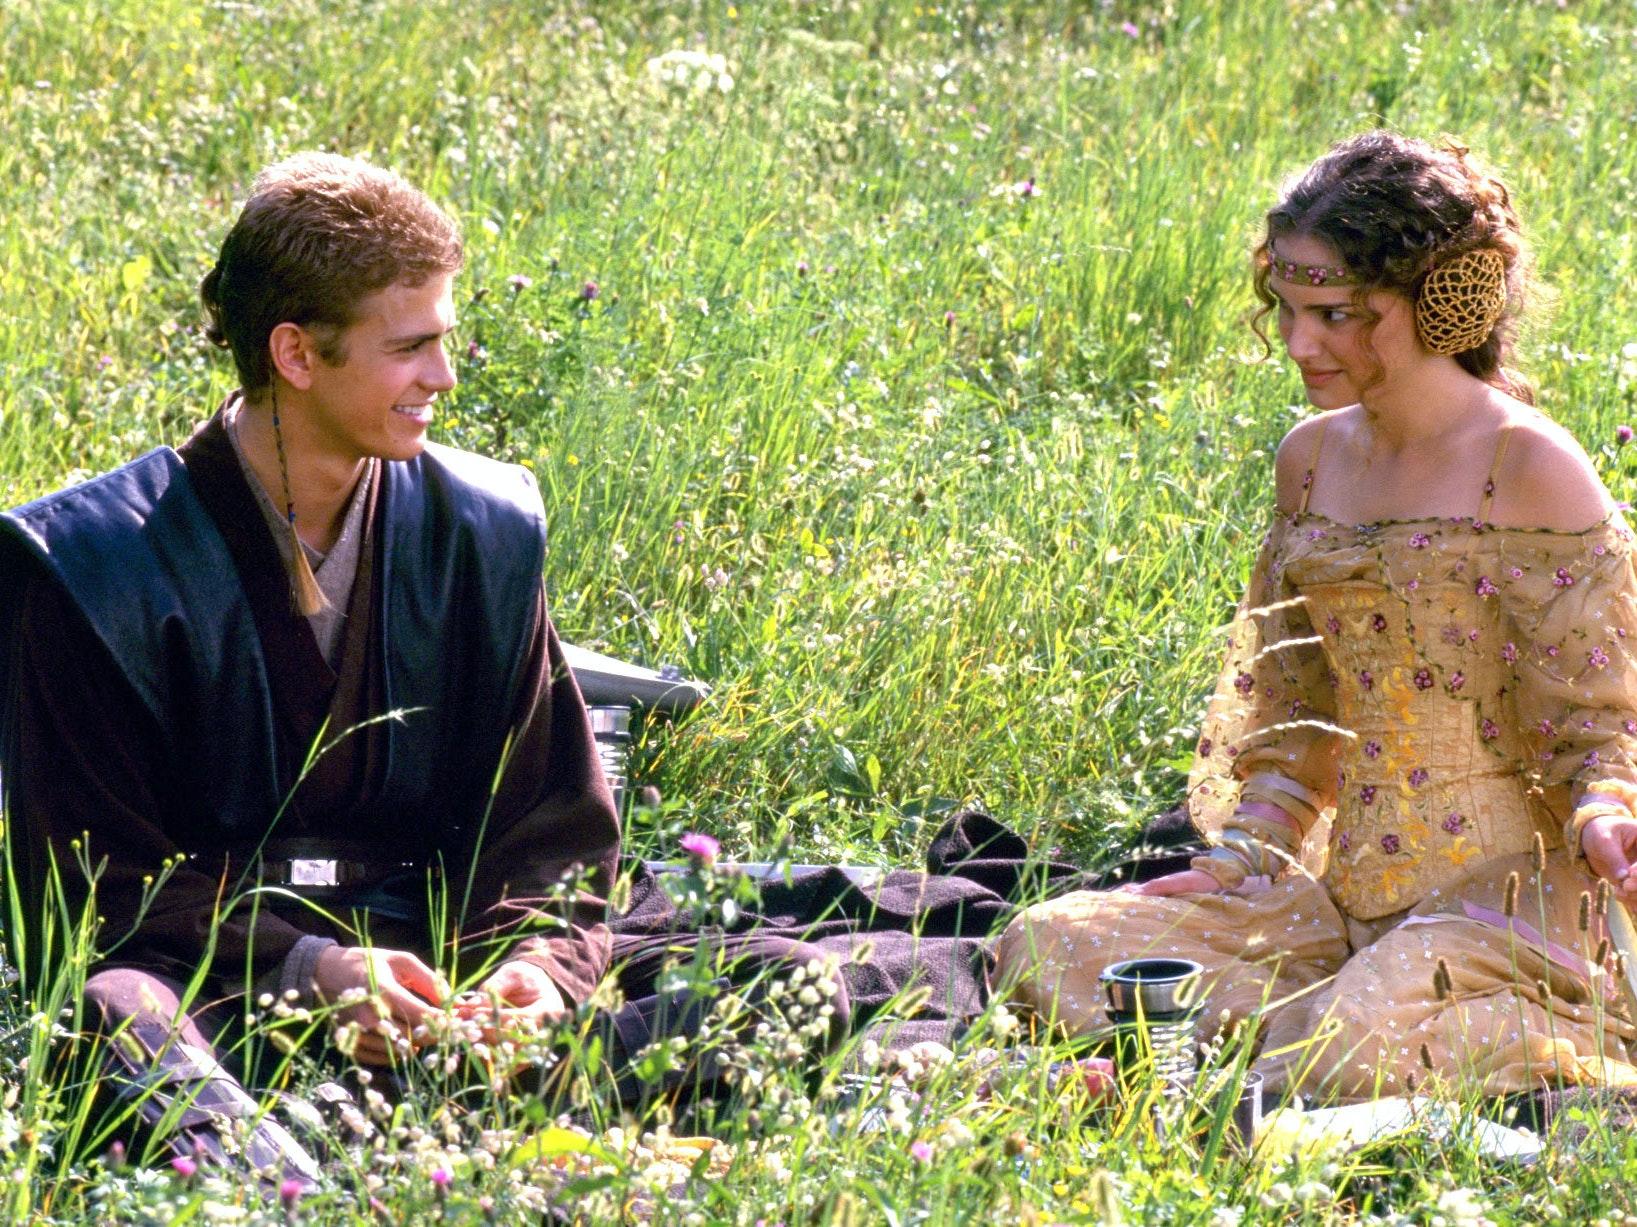 Anakin Skywalker Might Not Have Really Loved Padmé Amidala